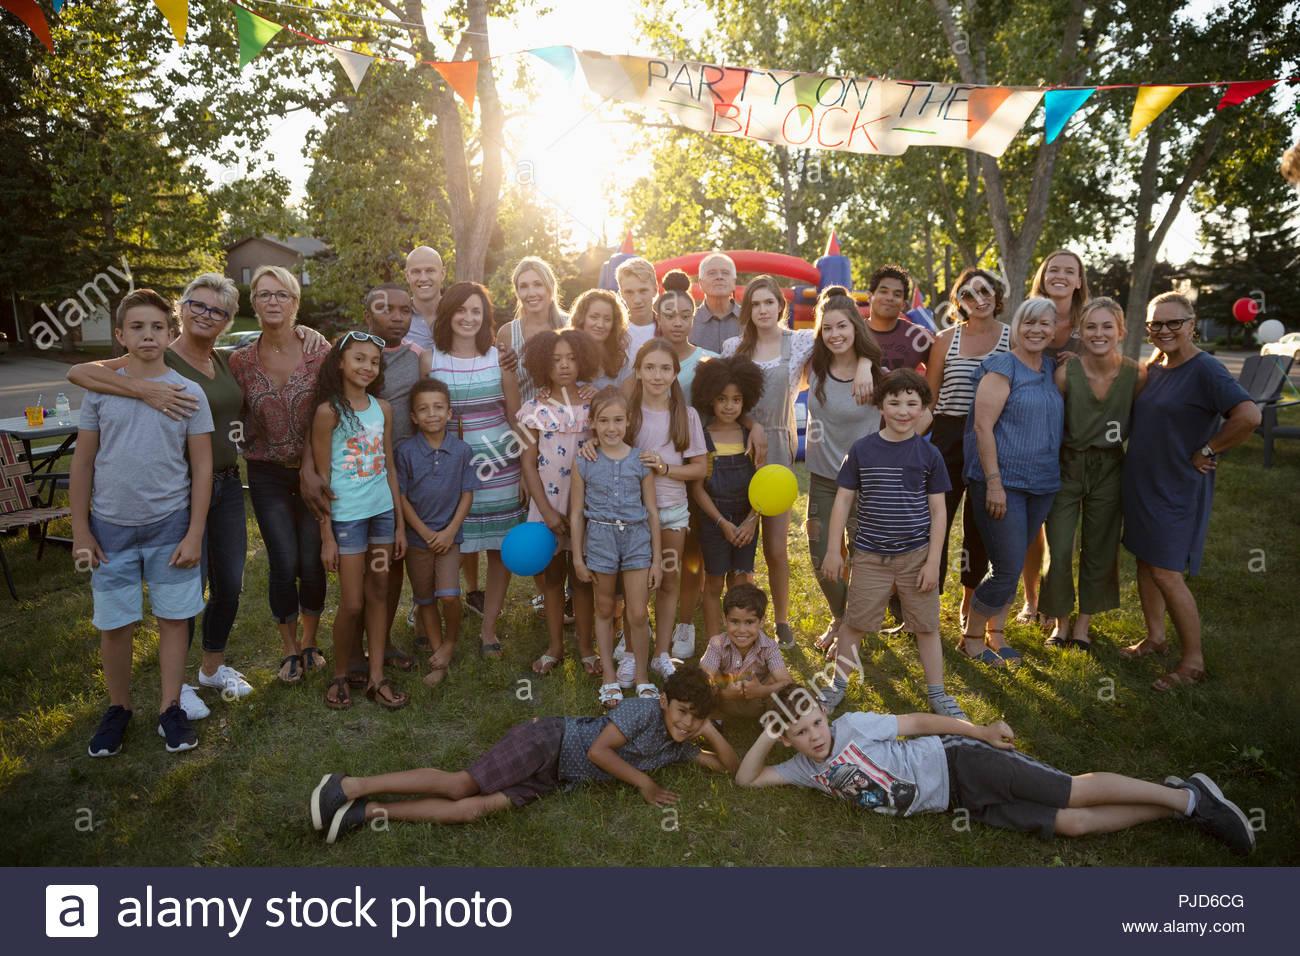 Portrait happy neighbors at summer neighborhood block party in park - Stock Image